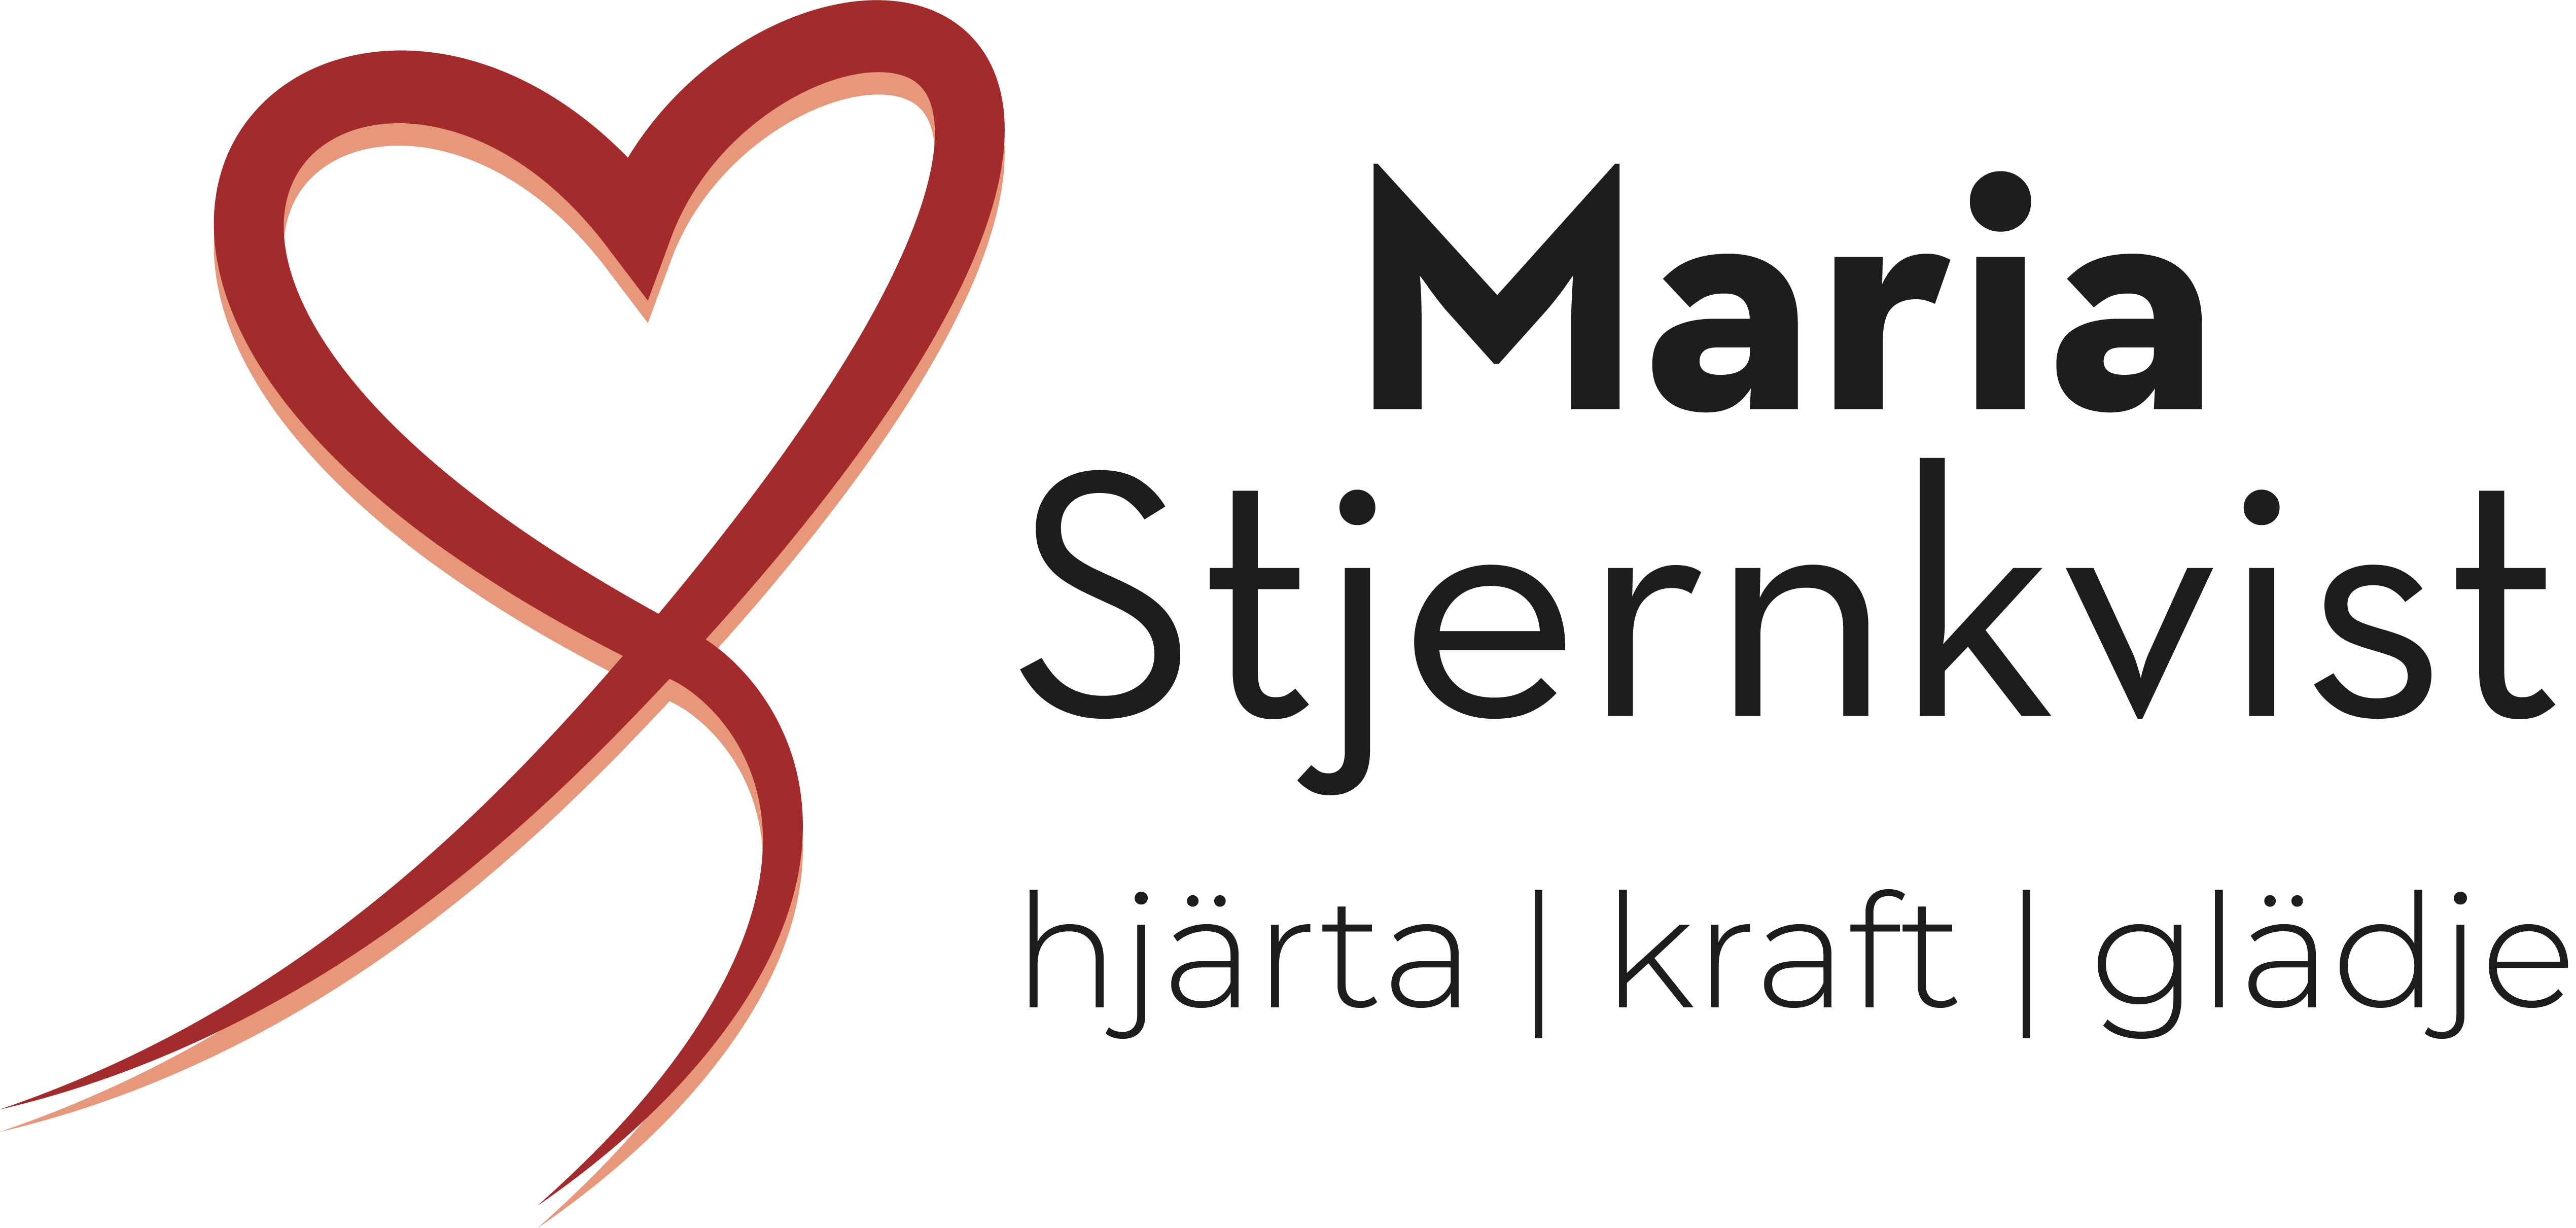 MARIA STJERNKVIST